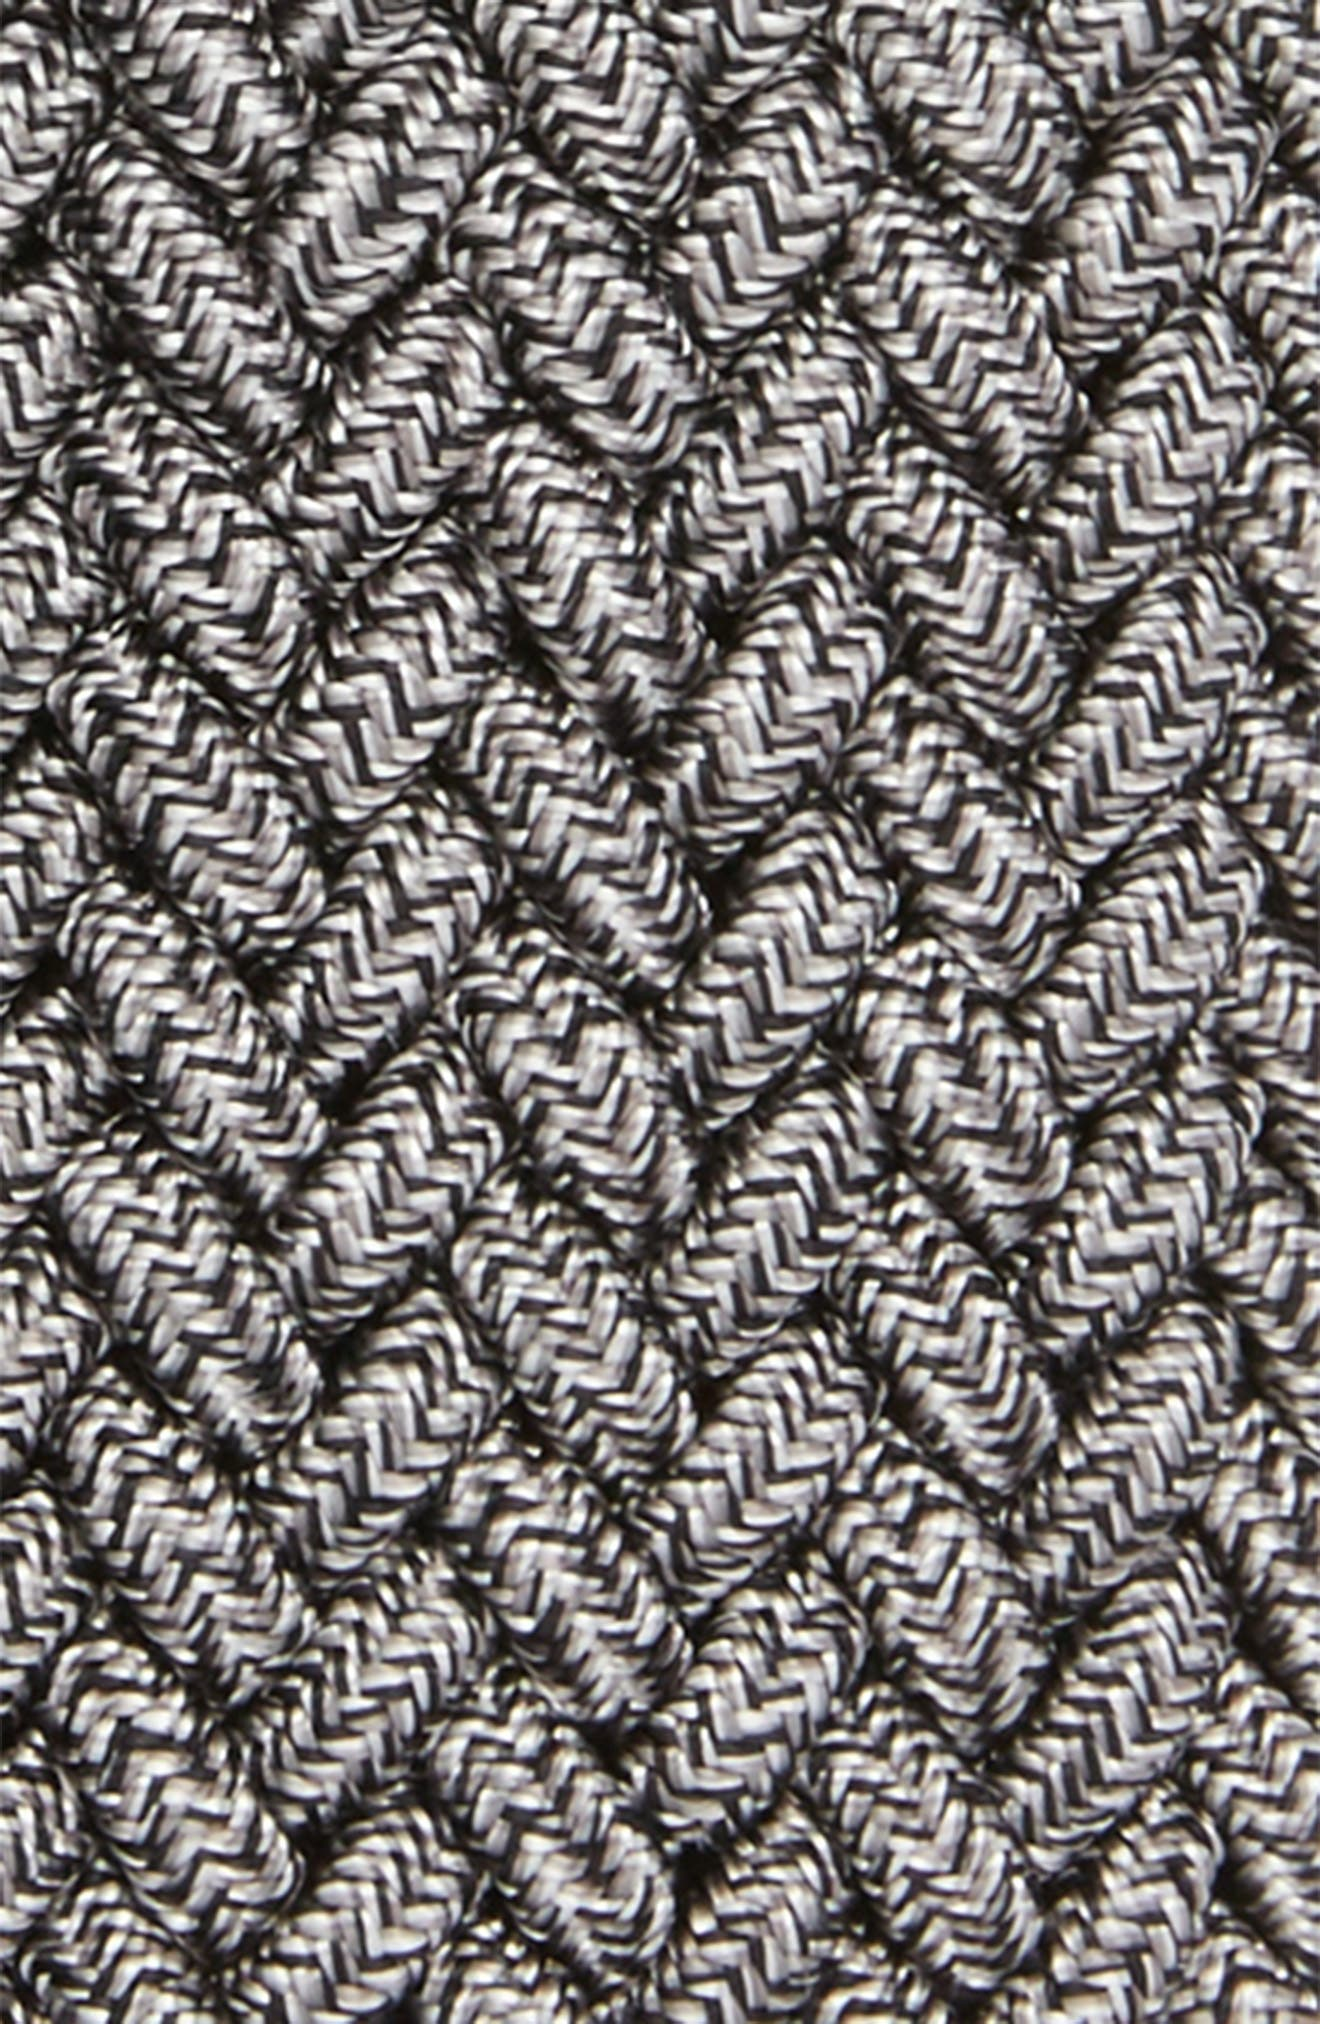 Braided Mélange Belts,                             Alternate thumbnail 2, color,                             GREY